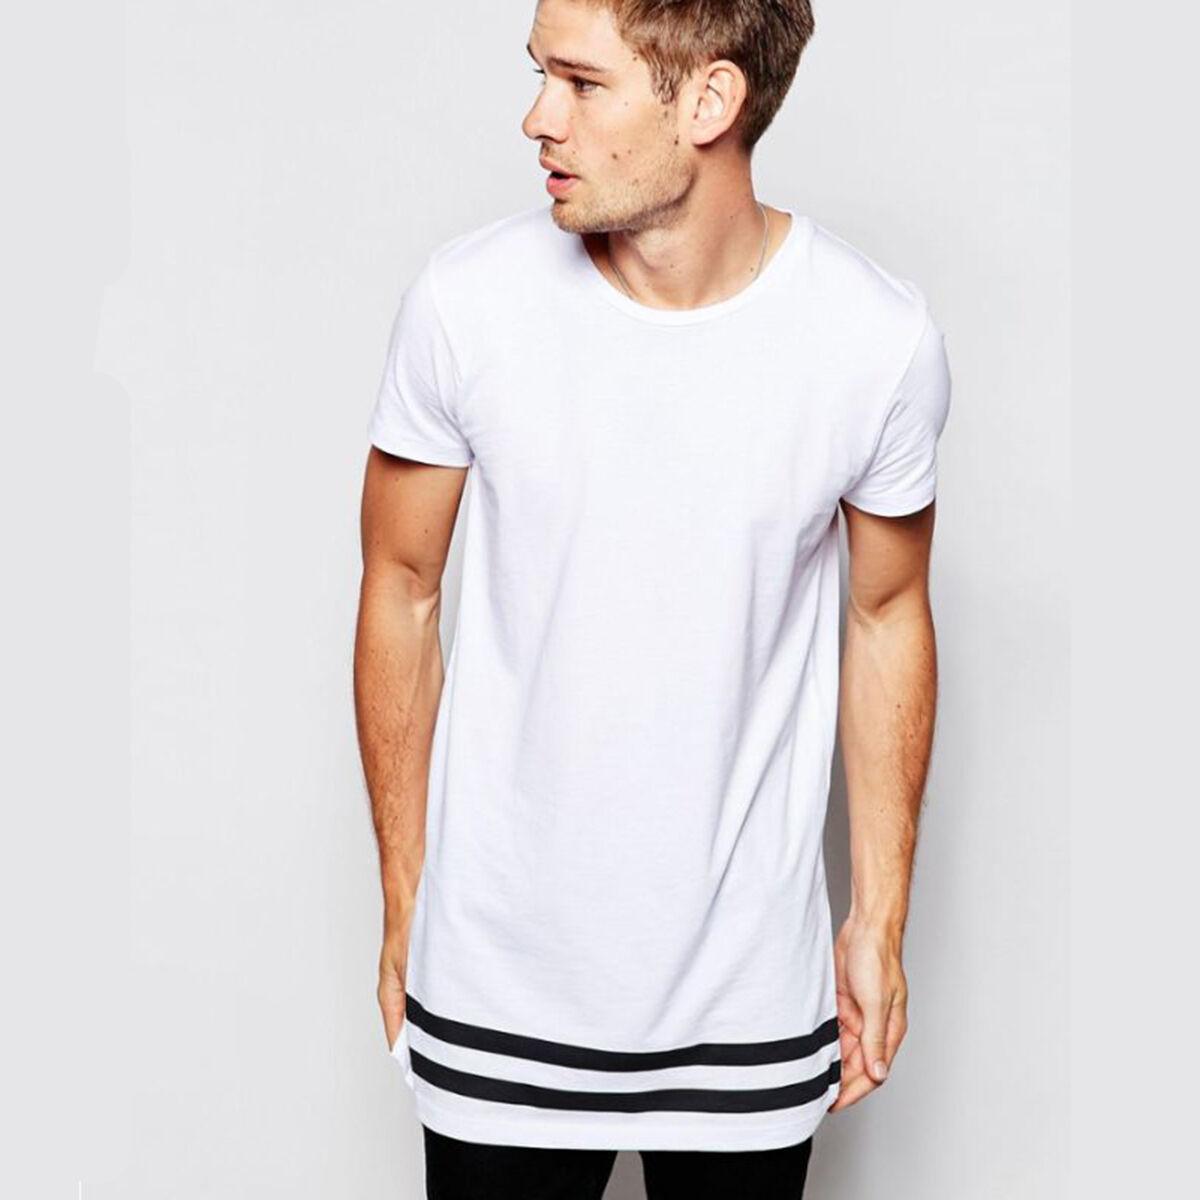 b098790e5 Size Type:Regular Sleeve Length:Short Sleeve Pattern:Striped Striped:Hip  hop. Size (Men's):S,M,L,XL,2XL Color:Black,White Package:1 Men T Shirt